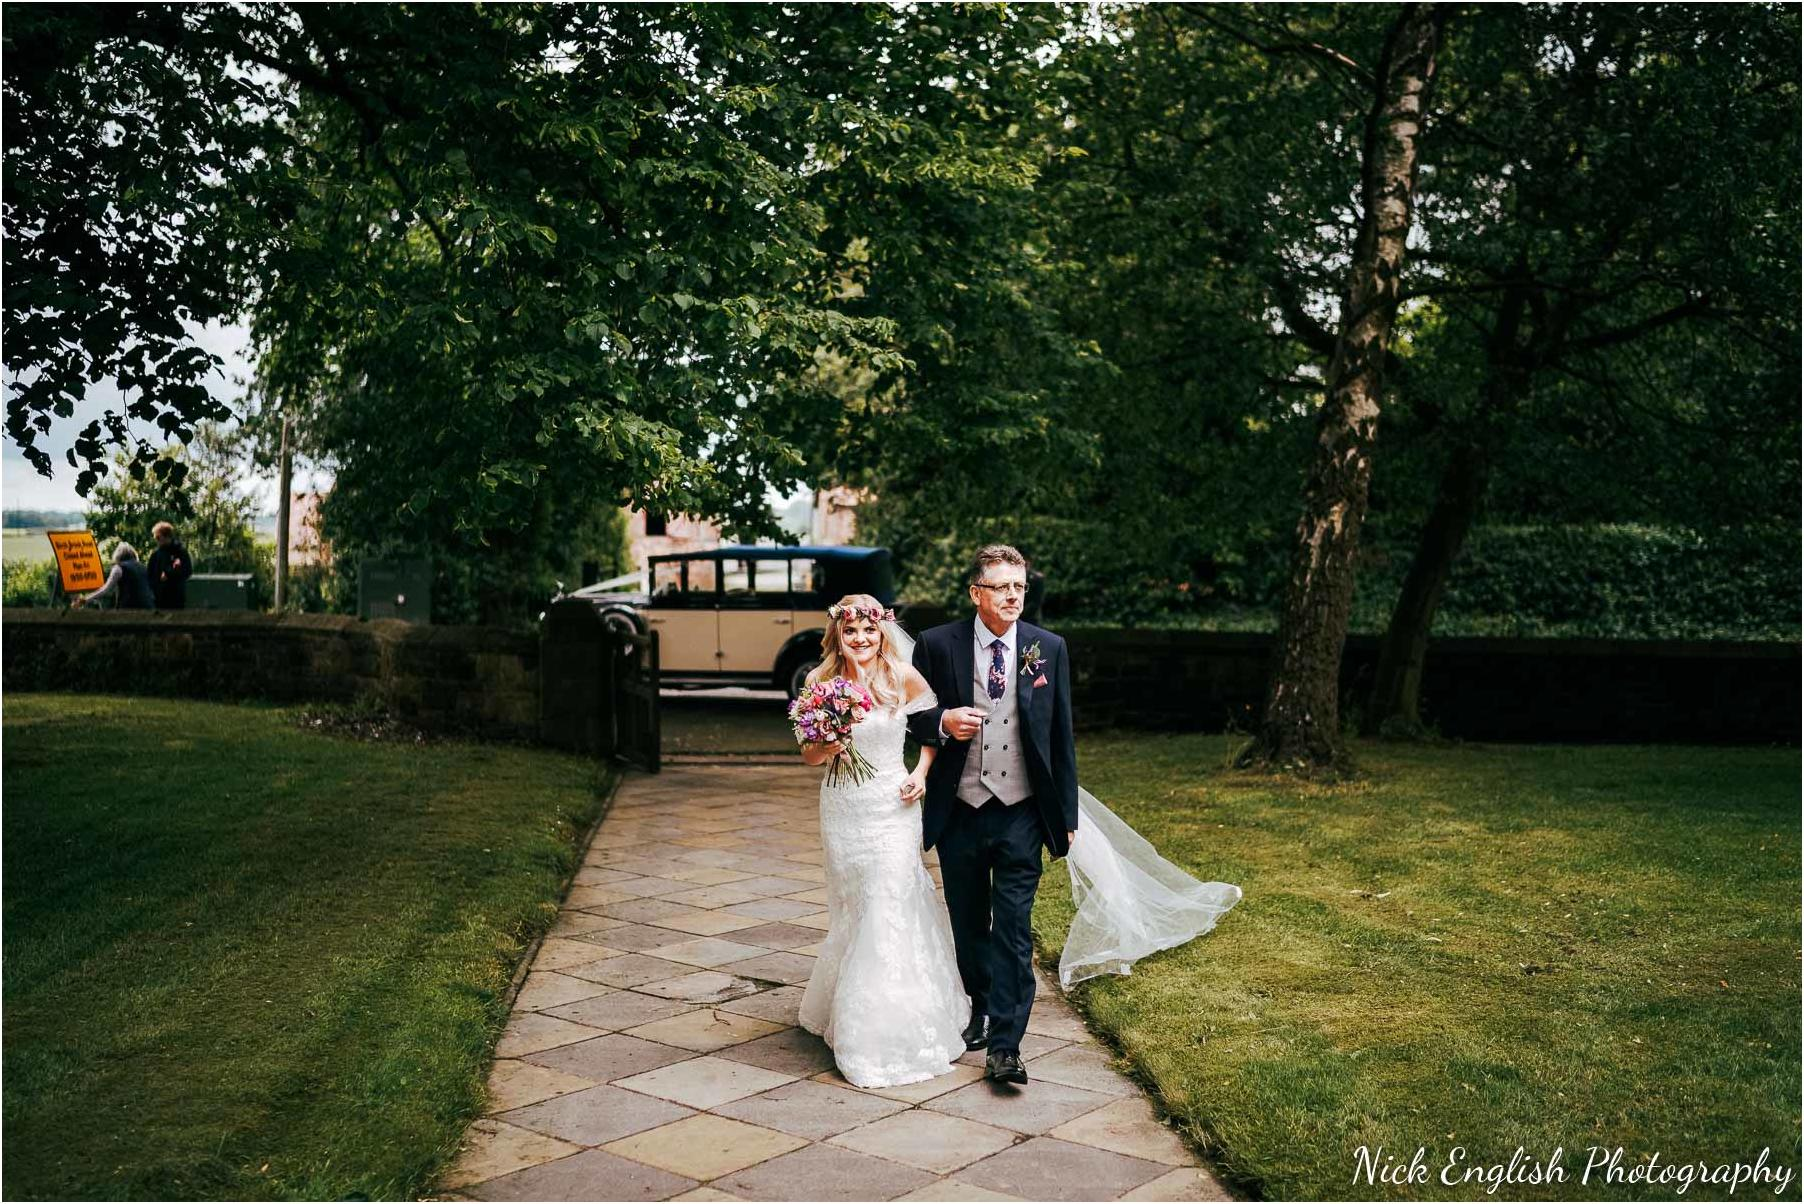 Whitebottom_Farm_Wedding_Manchester_Photograph-22.jpg